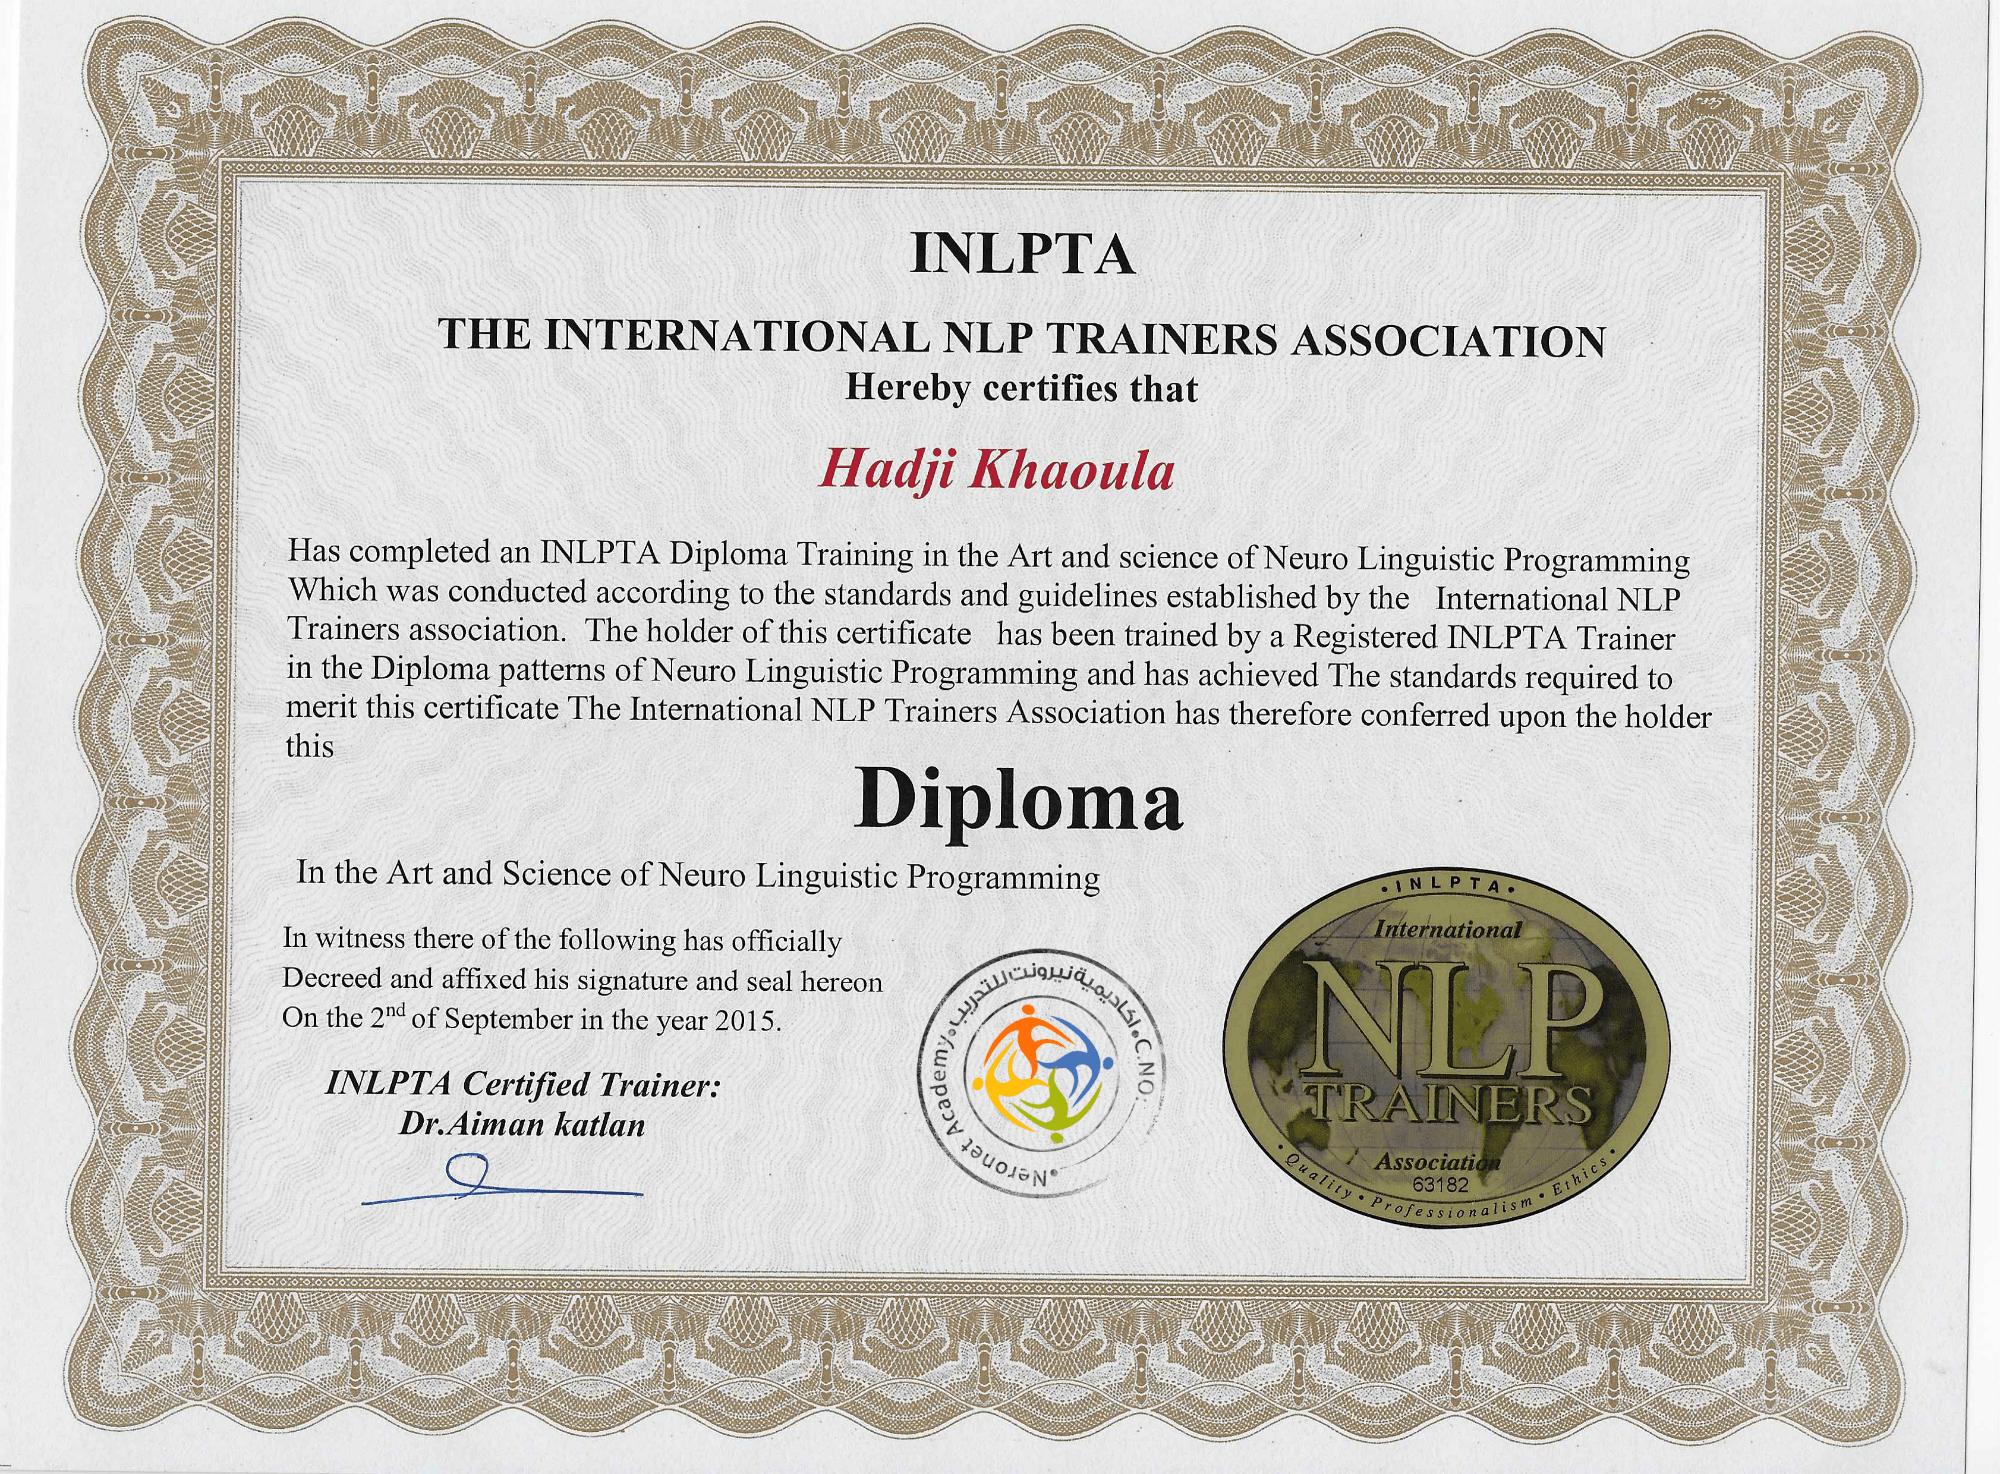 hadji-Neuro-linguistic programming-nlp-inlpta-neronet